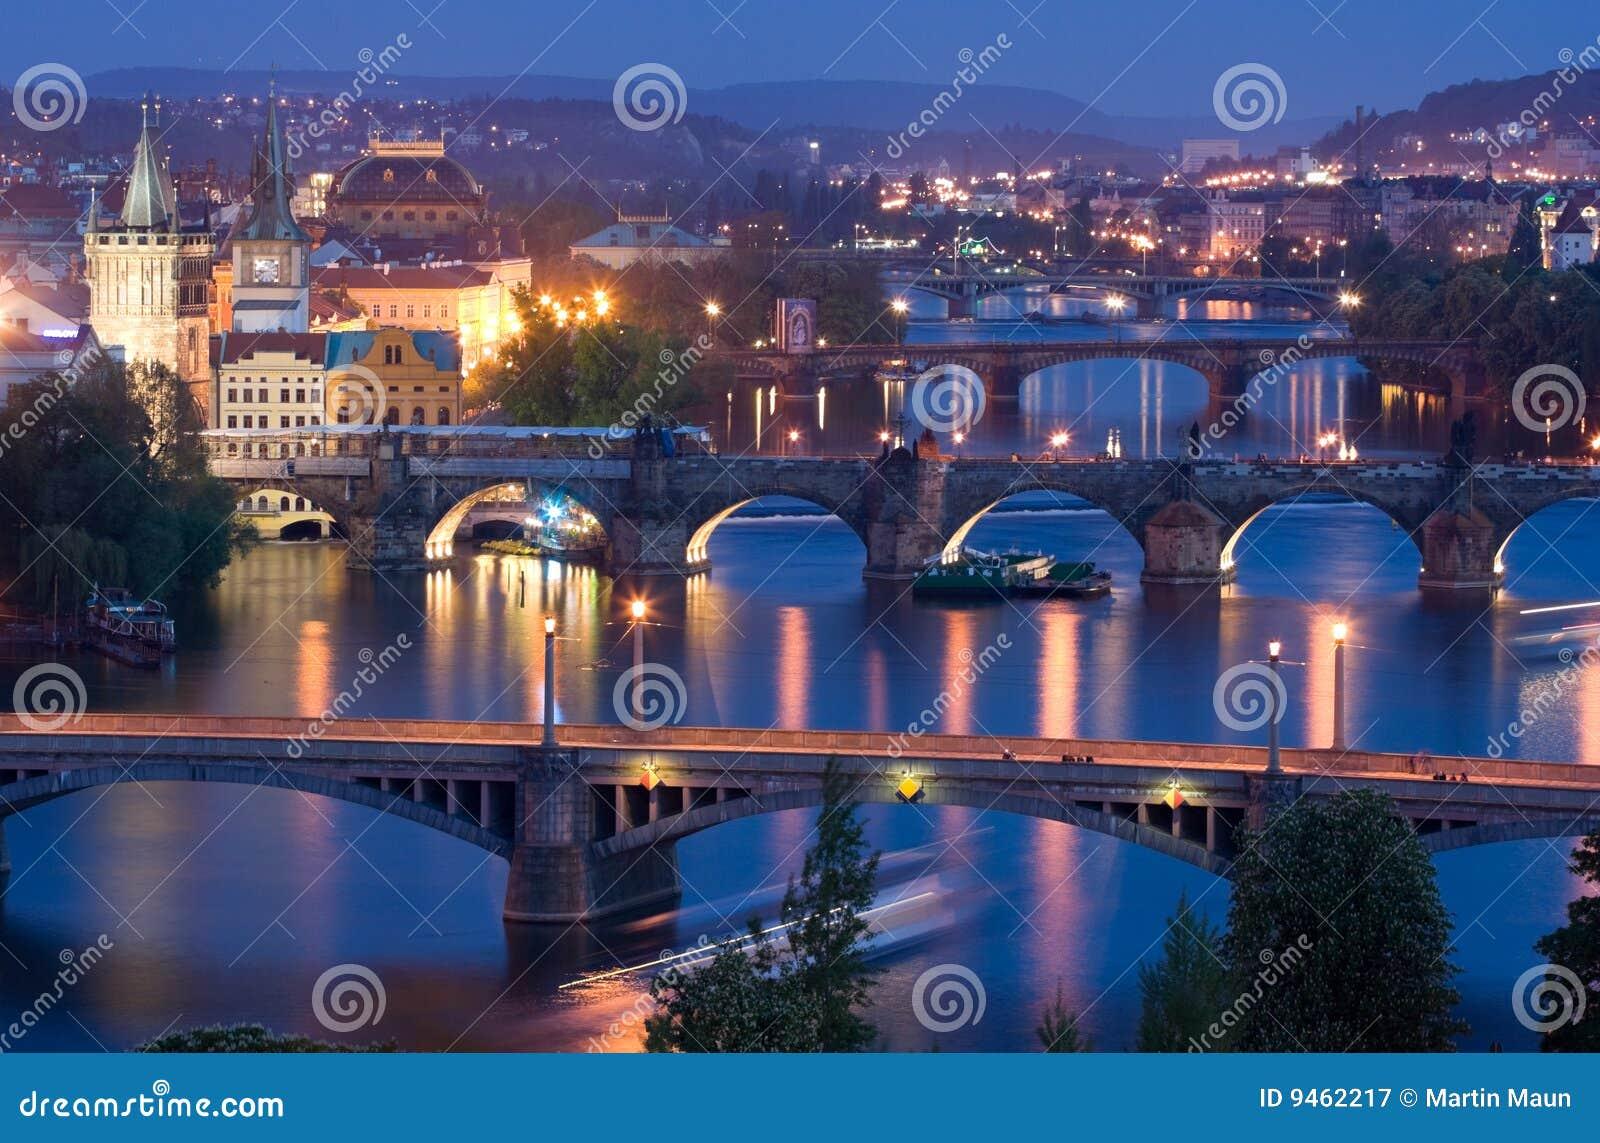 Download Bridges of Prague stock image. Image of historic, europe - 9462217